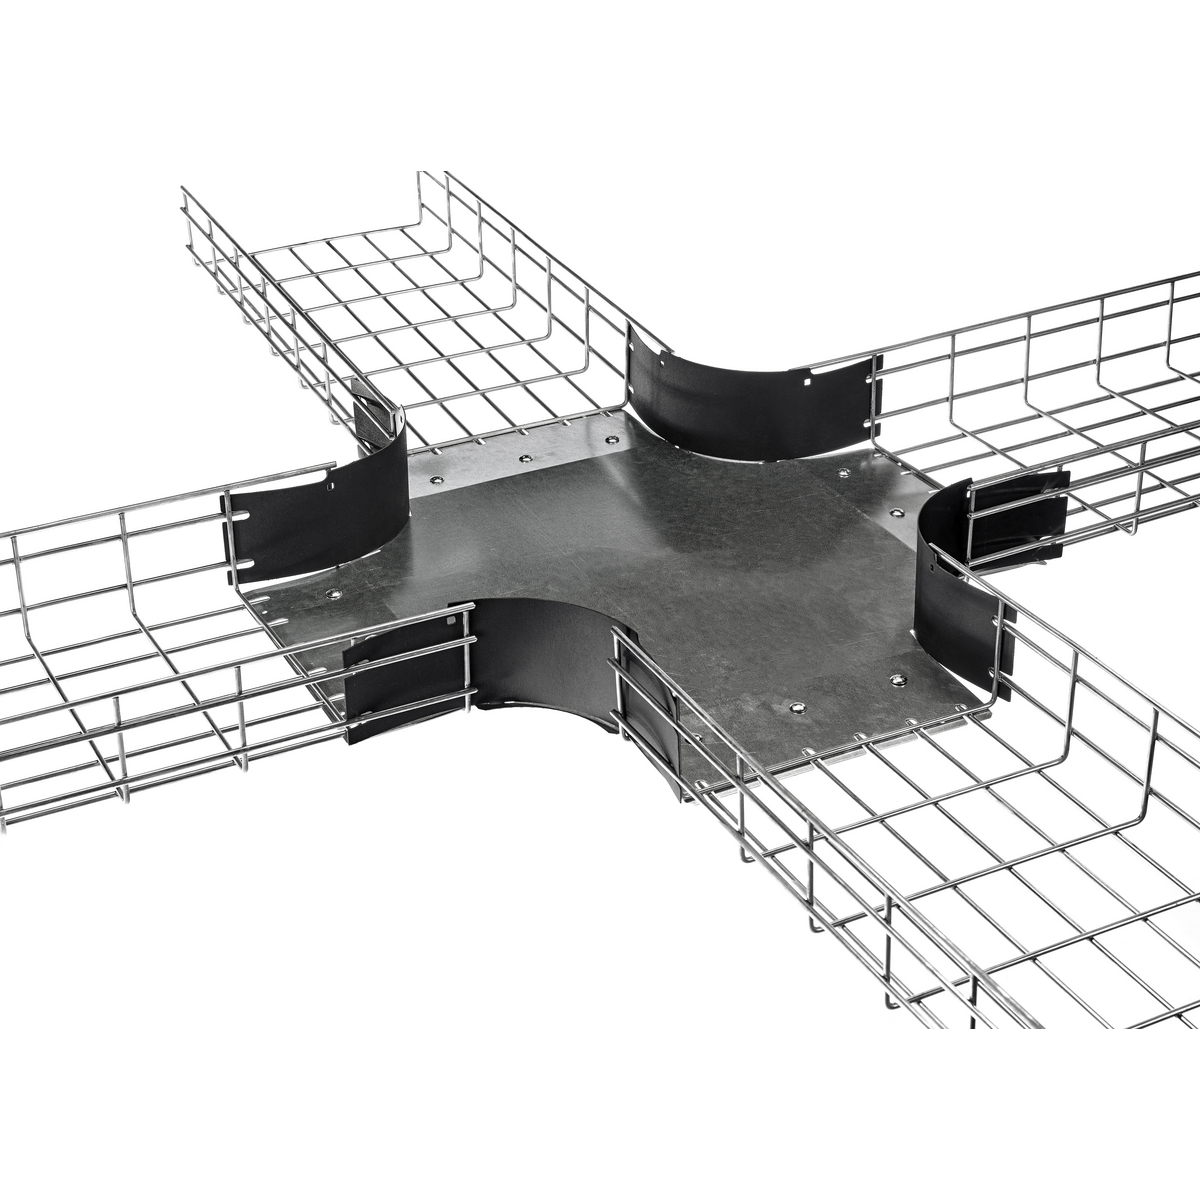 HBTI0616   Wire Basket Tray Accessories   Wire Basket Tray   Wire ...